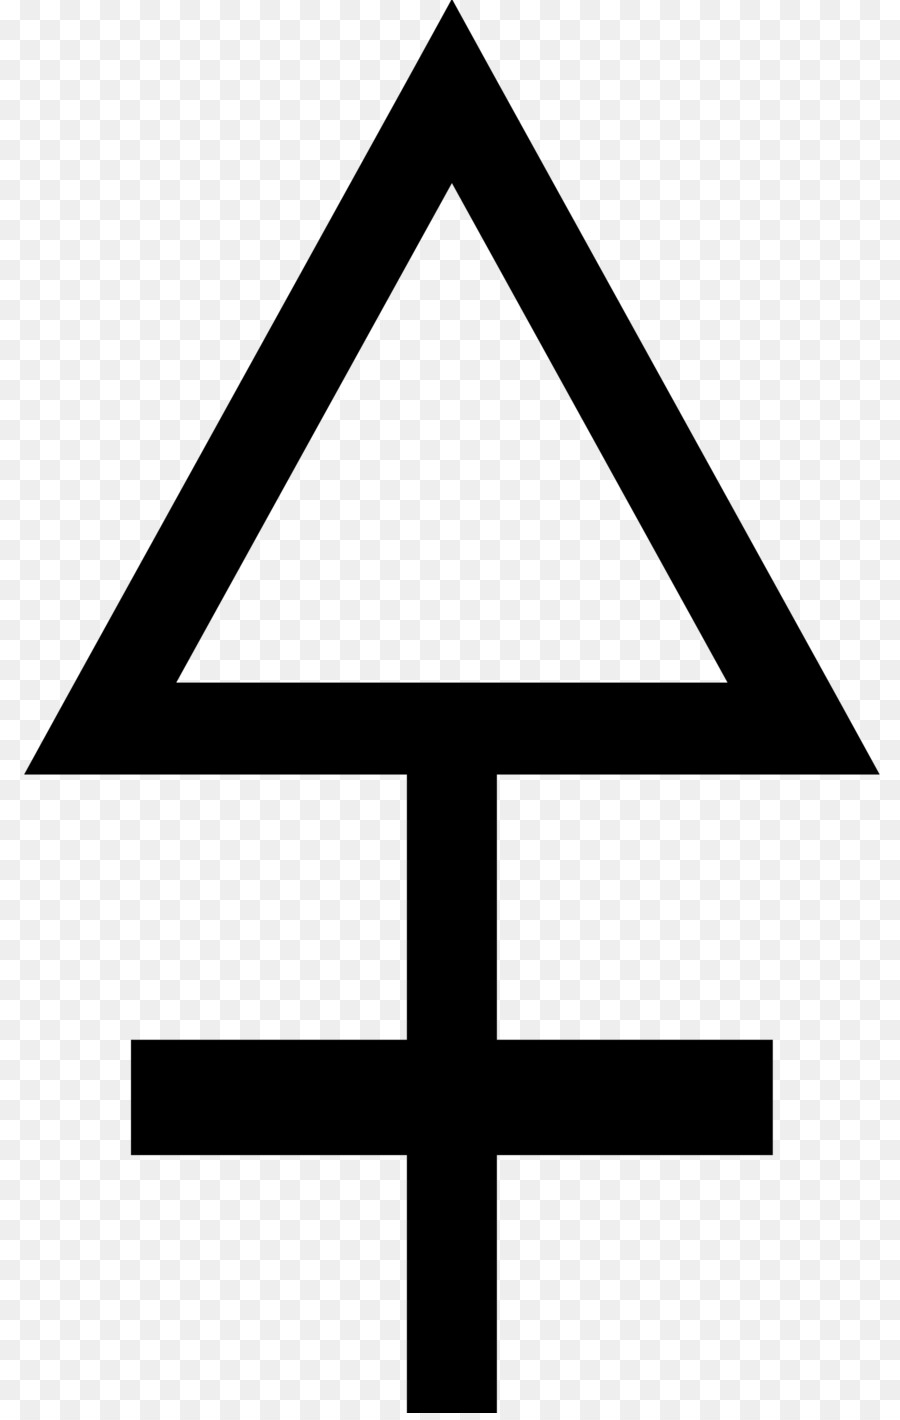 Astrological Symbols 2 Pallas Astronomical Symbols Athena